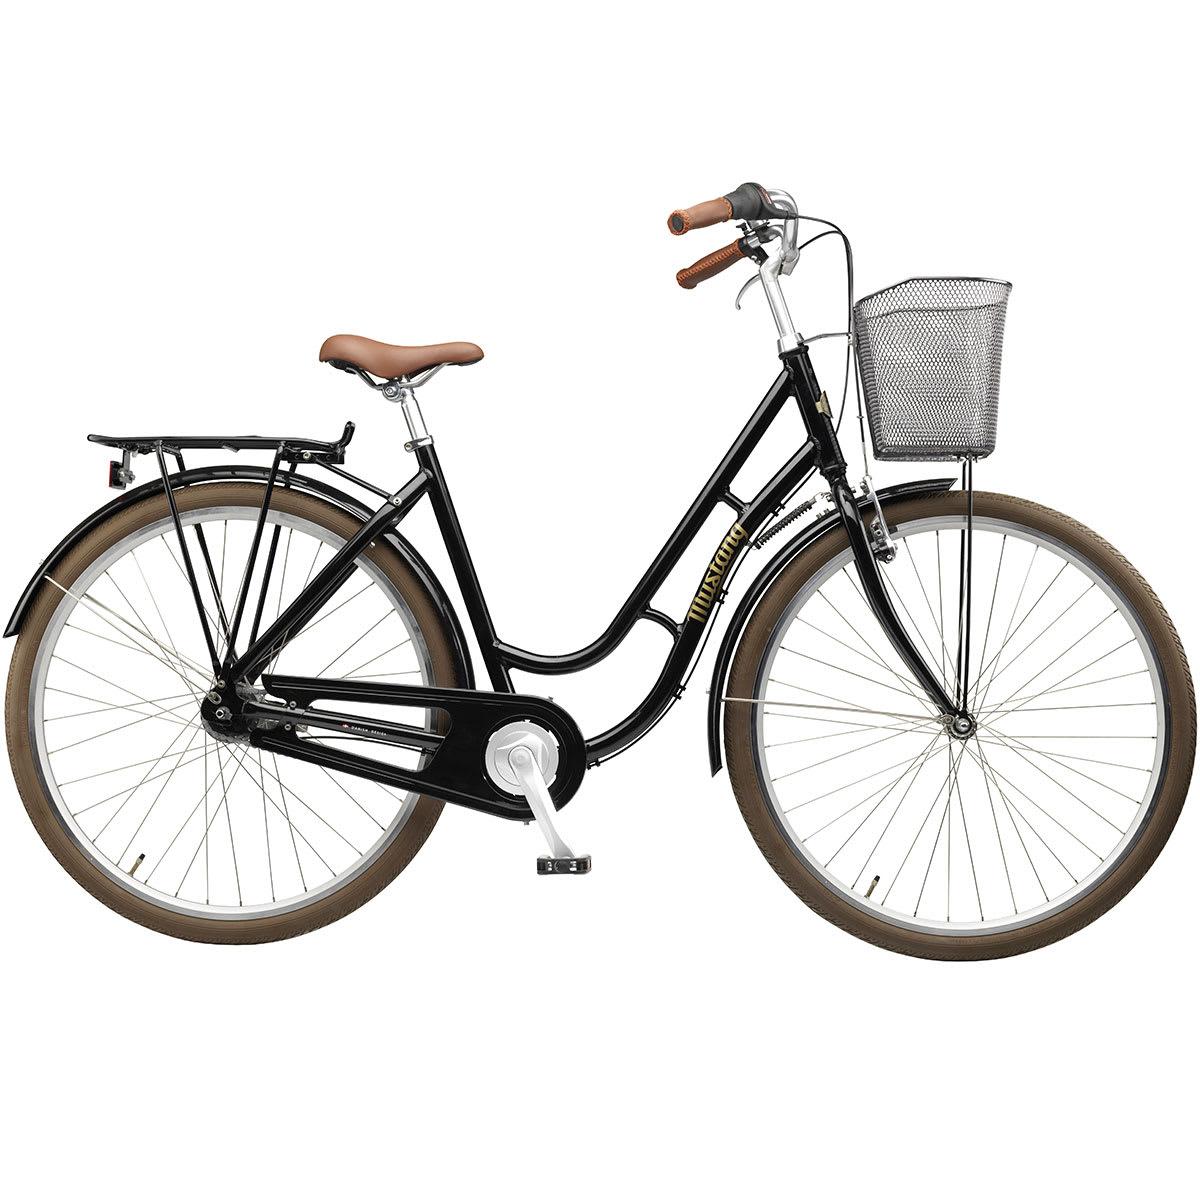 Elegant klassiker til hverdagen på byens travle cykelstier